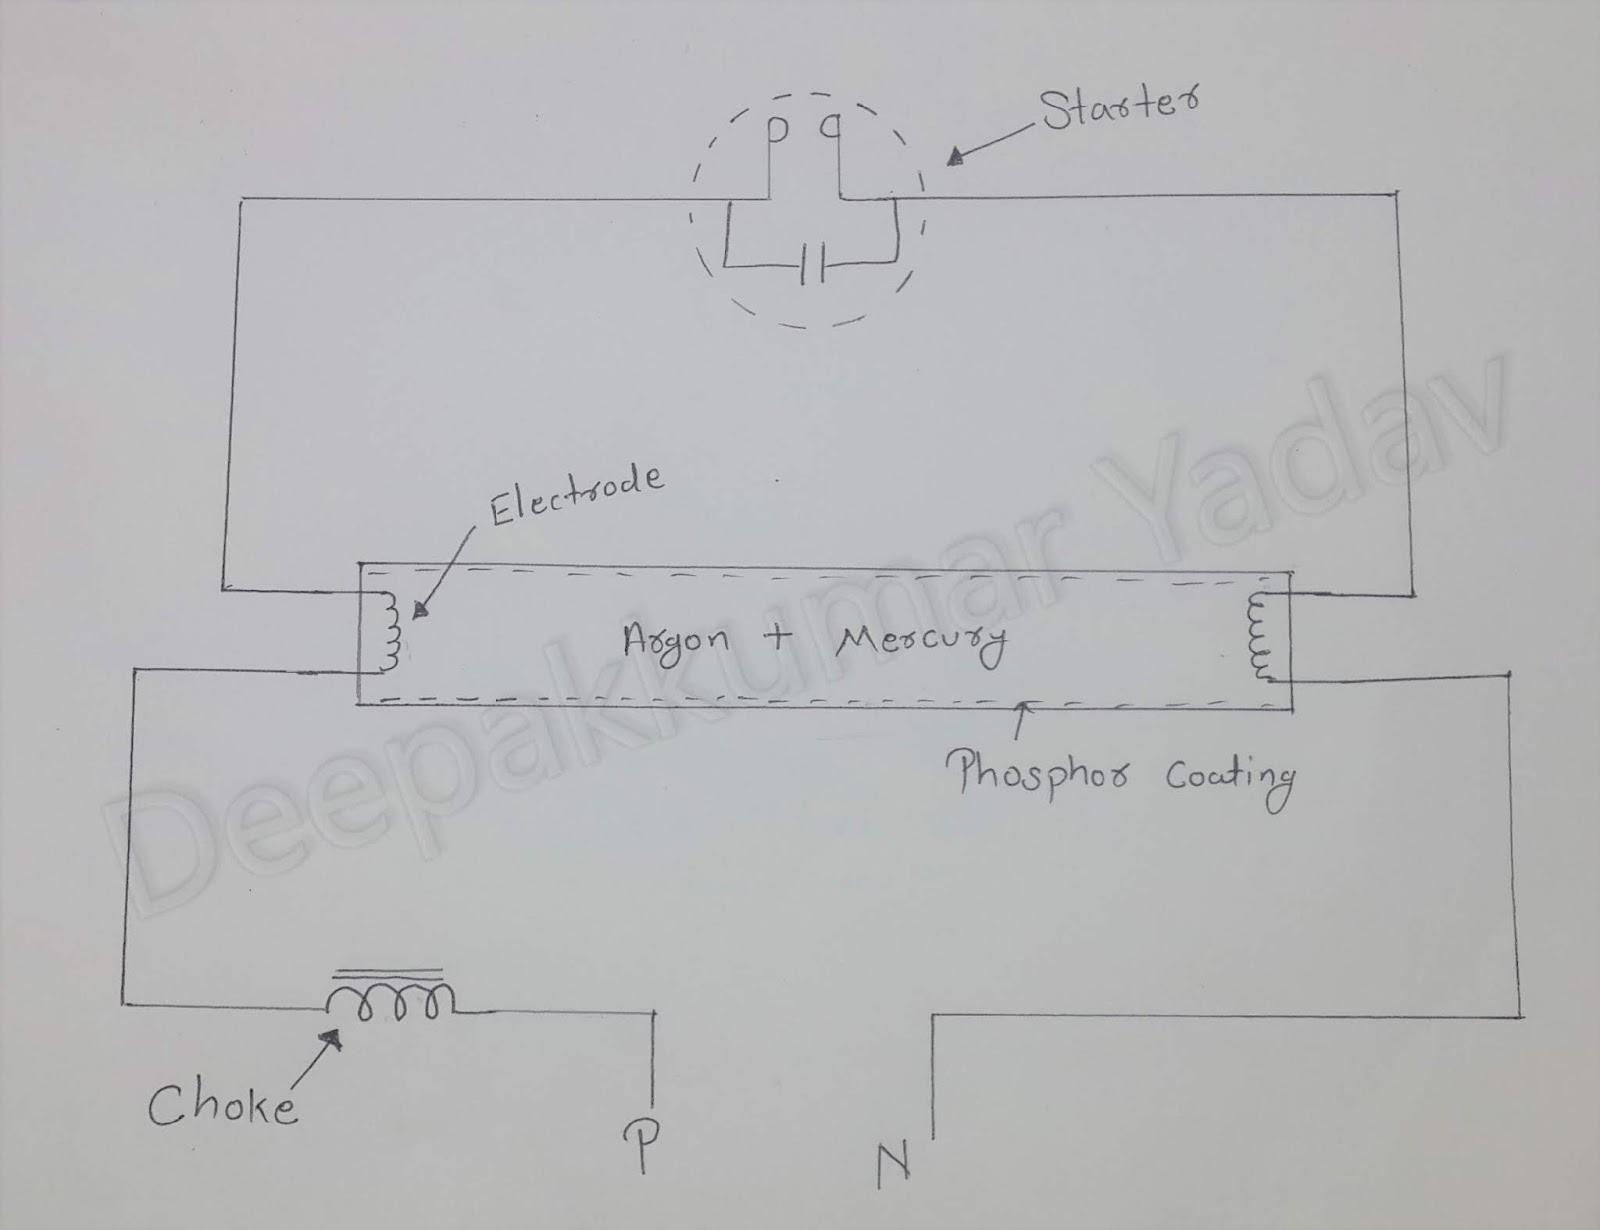 housewiring diagram